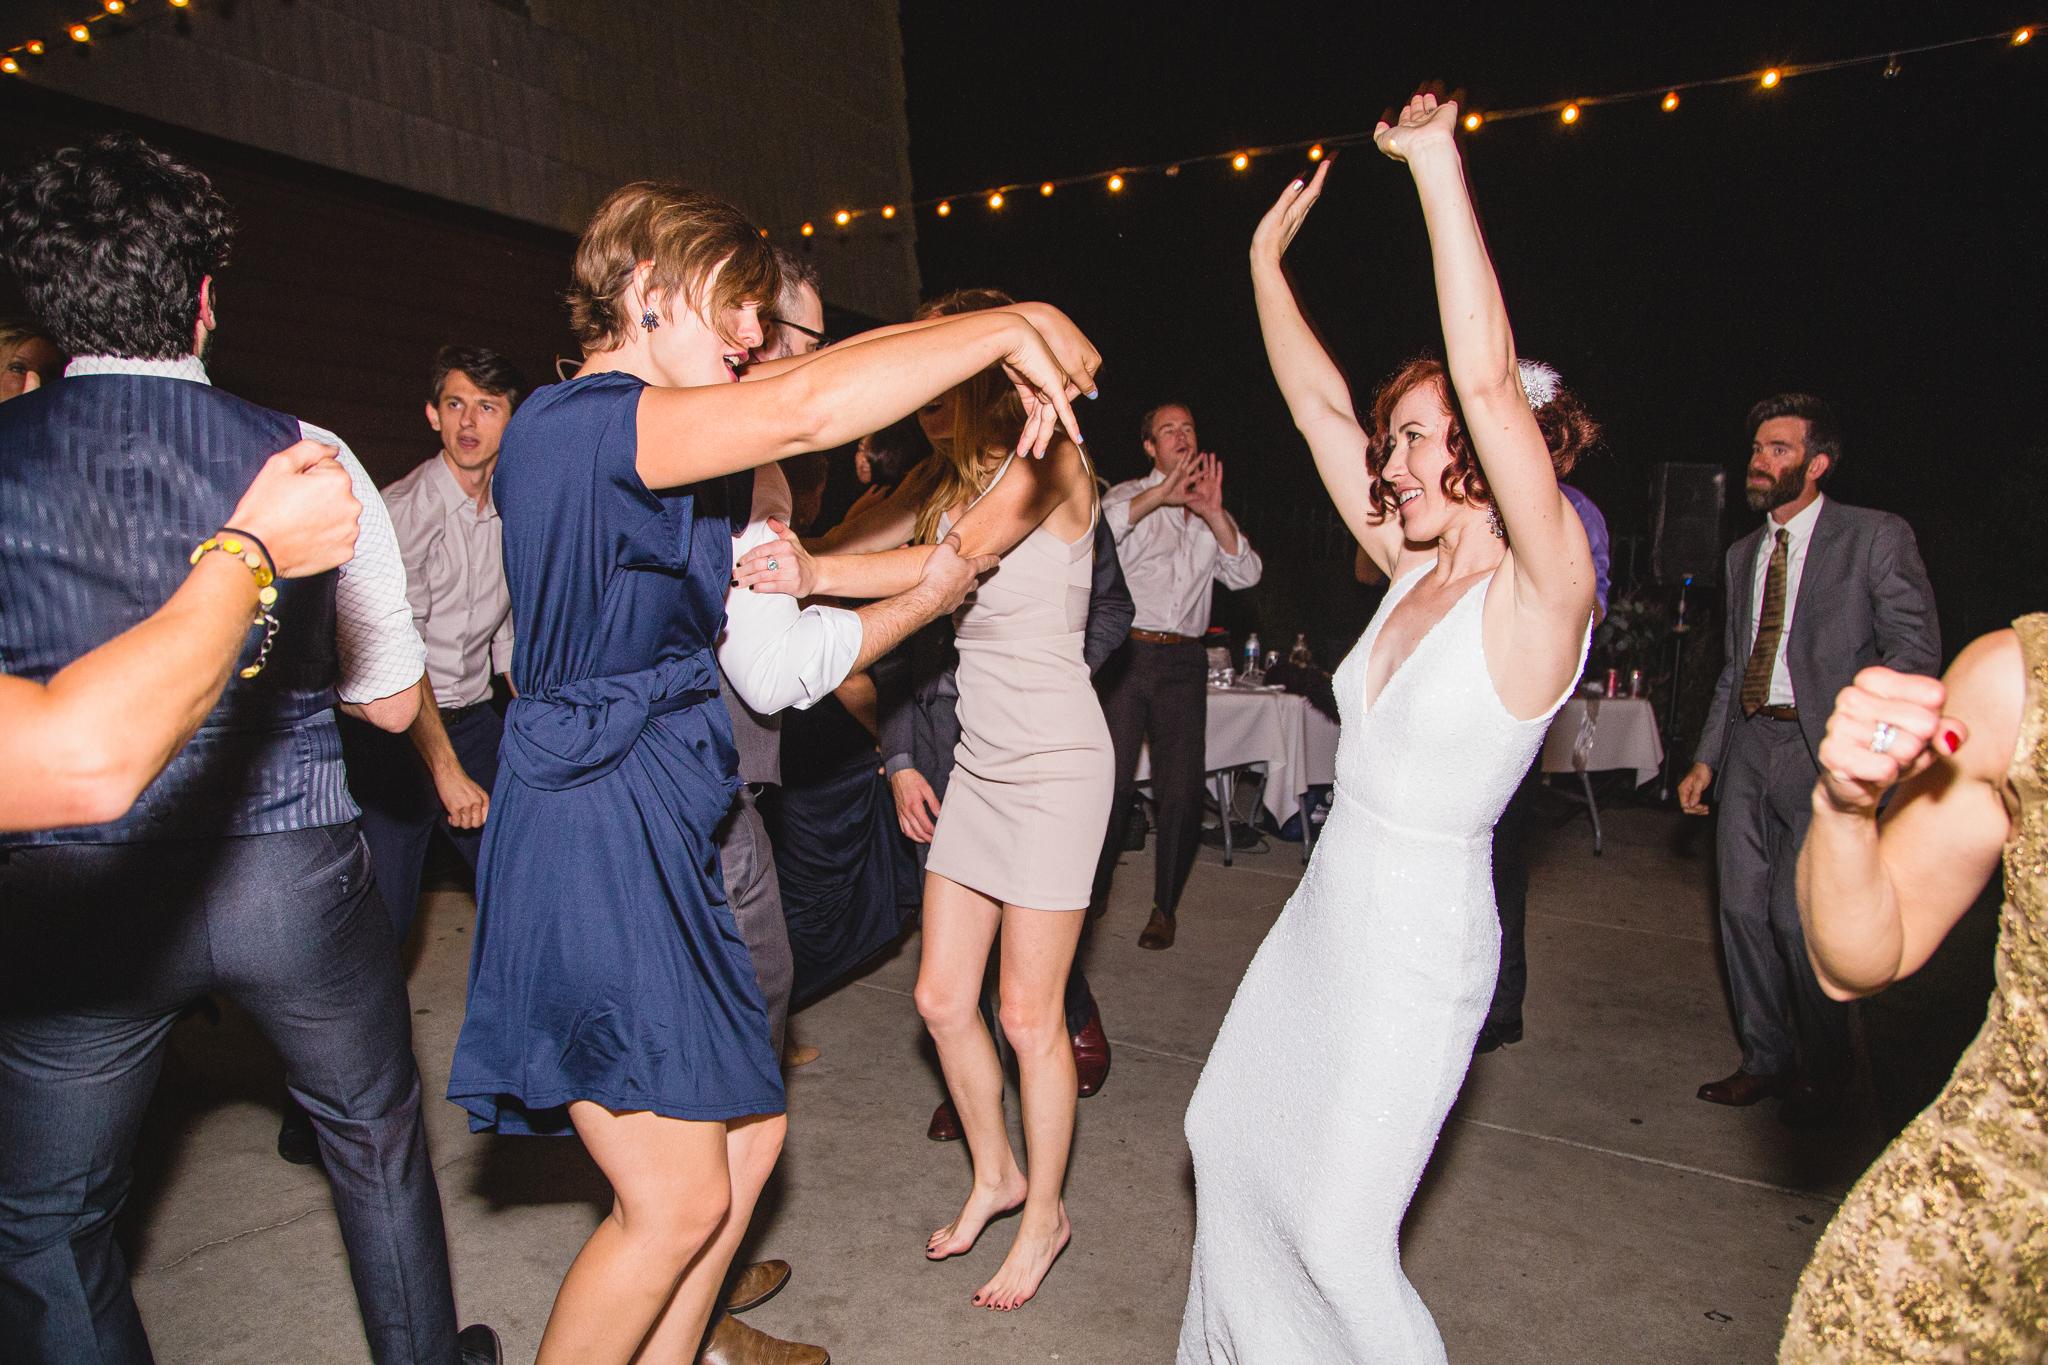 orange-county-wedding-dance-party-rebeccaylasotras-4.jpg